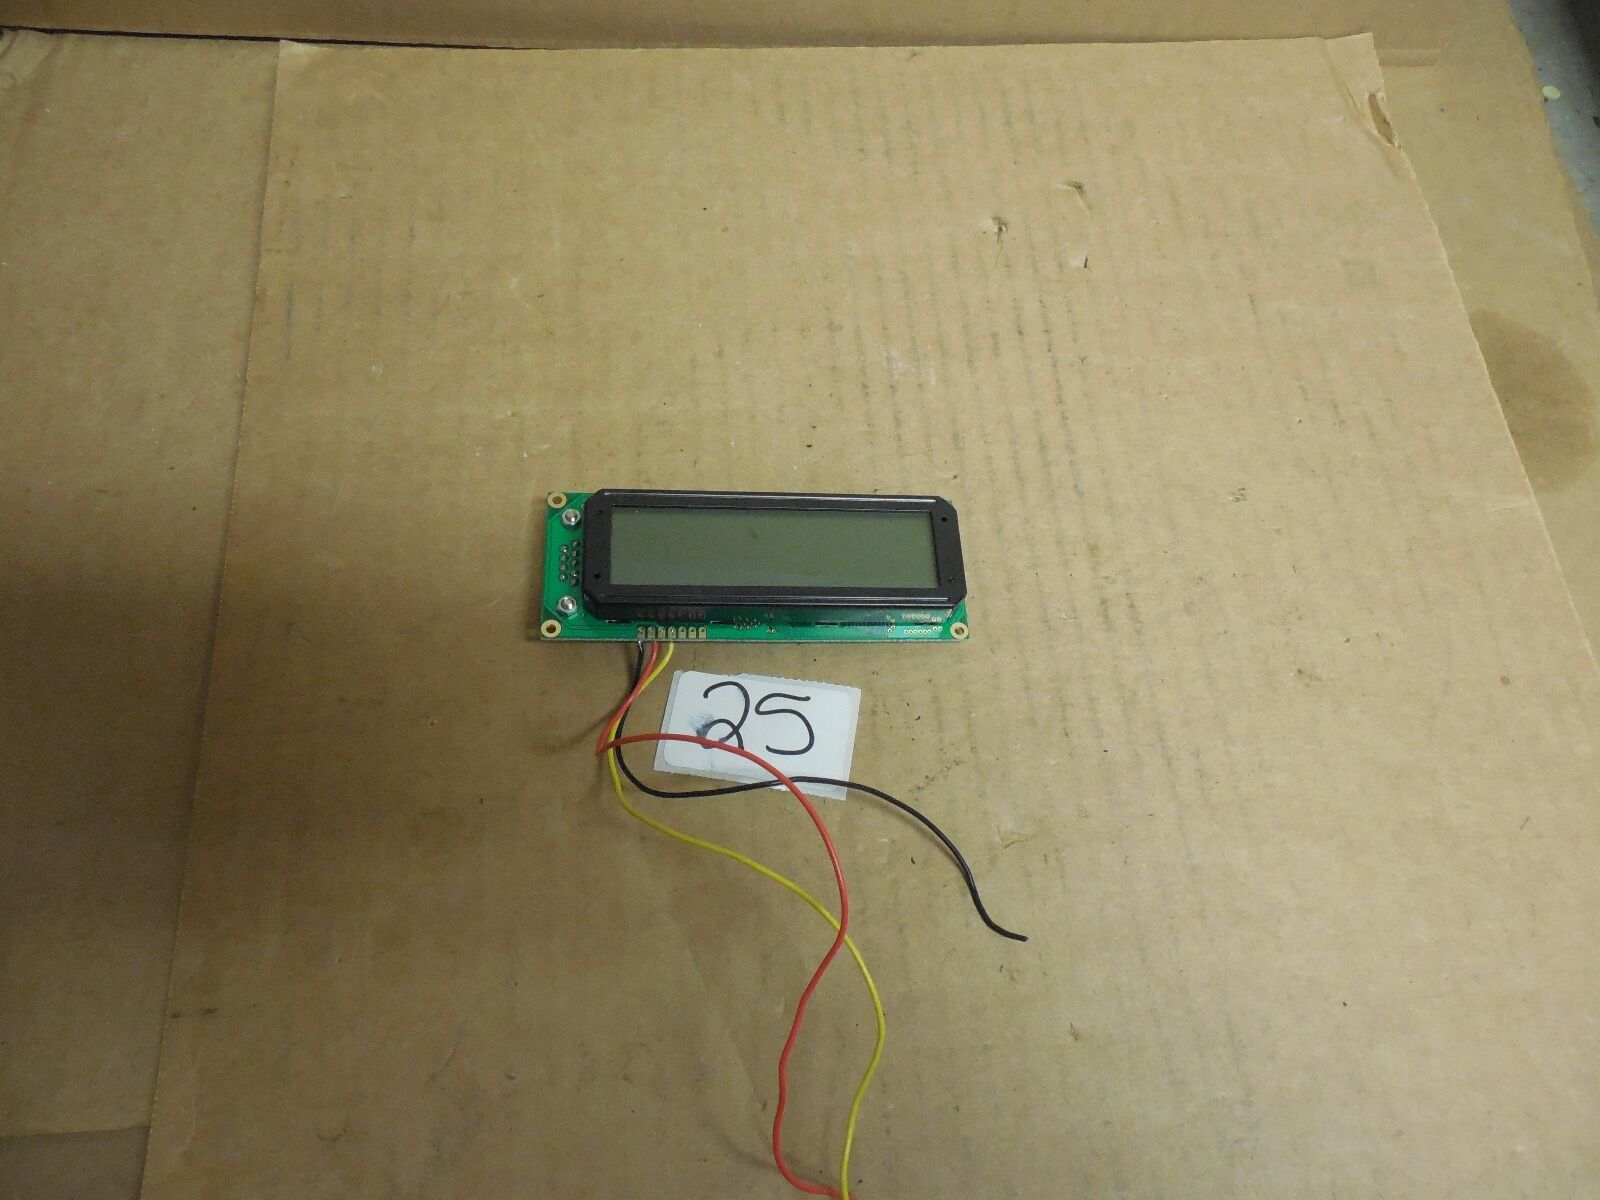 CRYSTALFONTZ LCD CIRCUIT BOARD CARD SKD162-632 V2.1